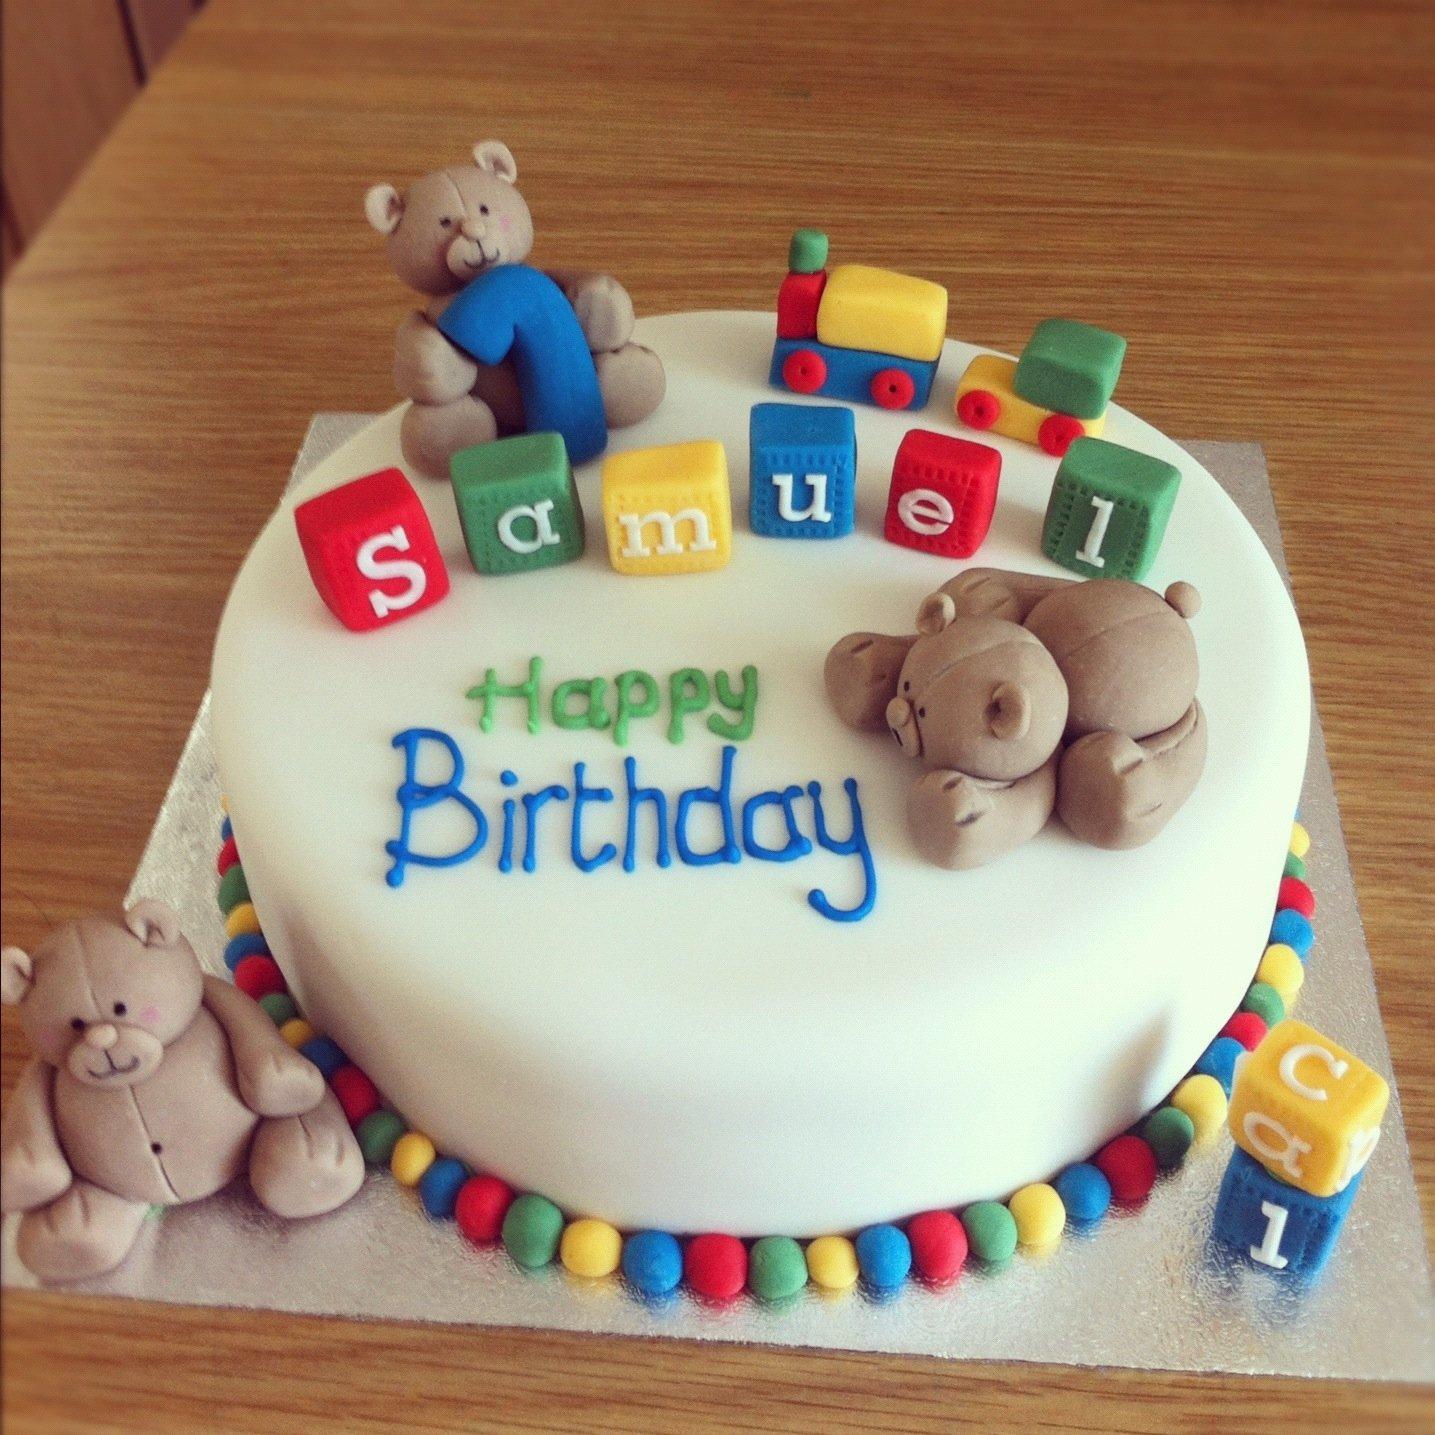 10 Unique First Birthday Cake Ideas Boy 15 baby boy first birthday cake ideas 4 2021